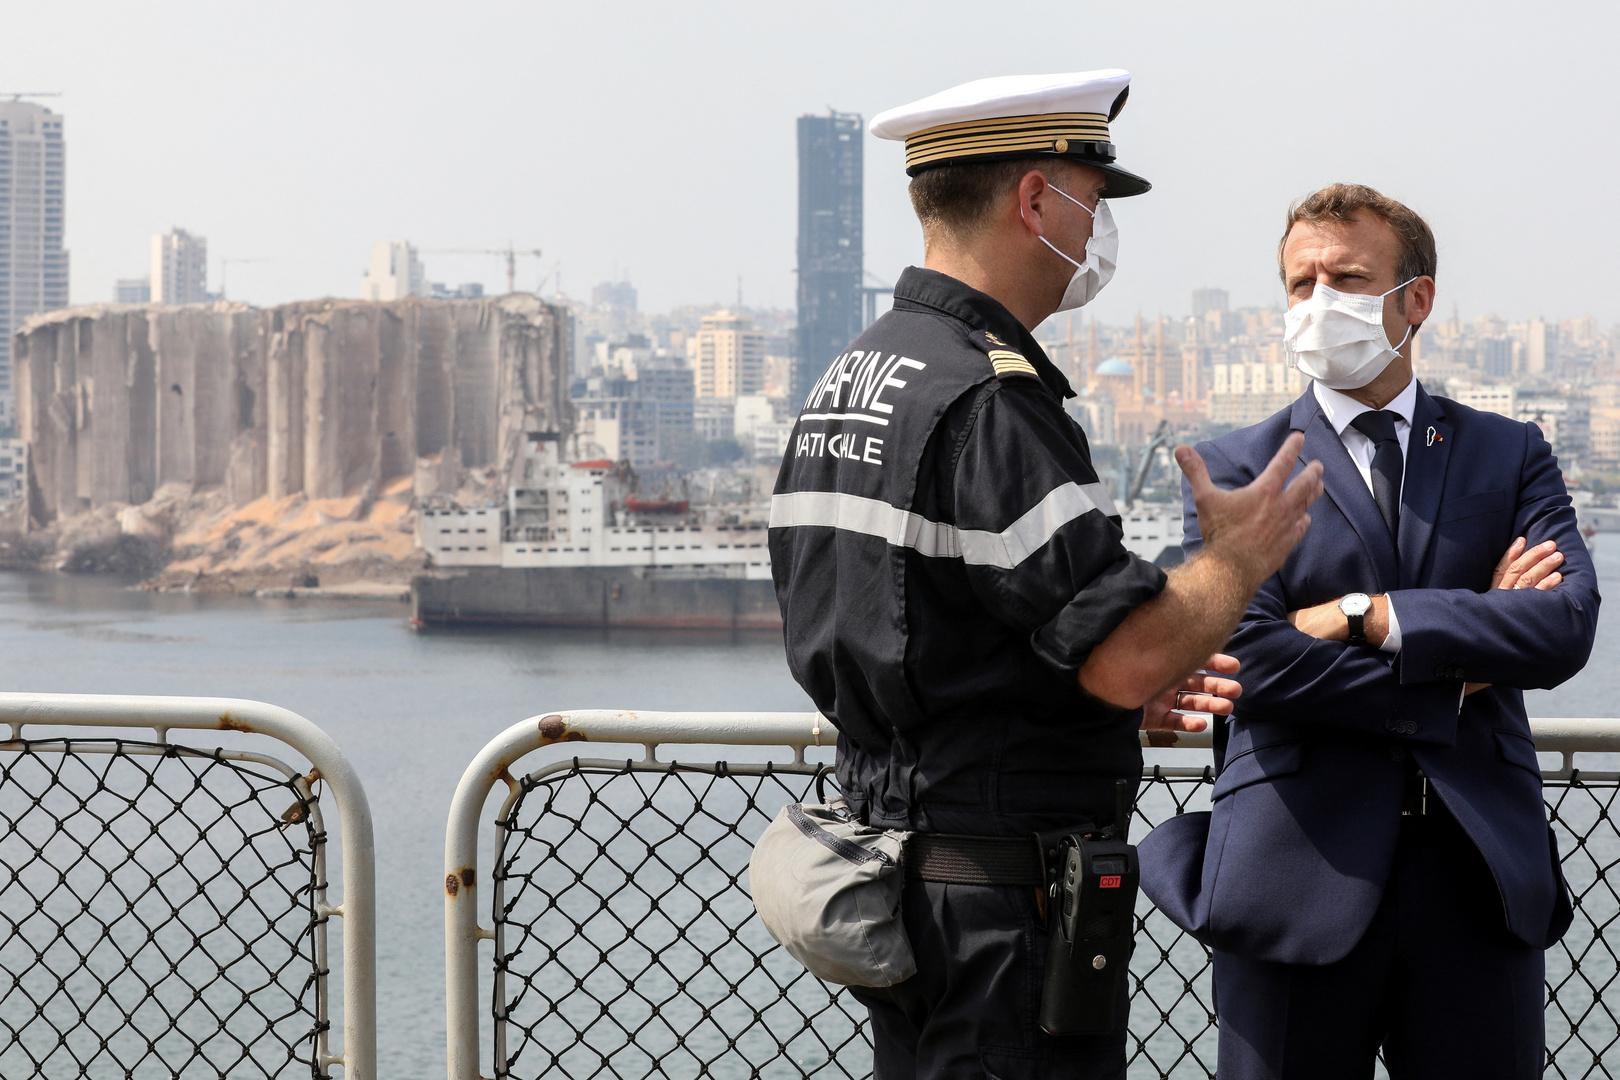 أردوغان: ماكرون طُرد من لبنان